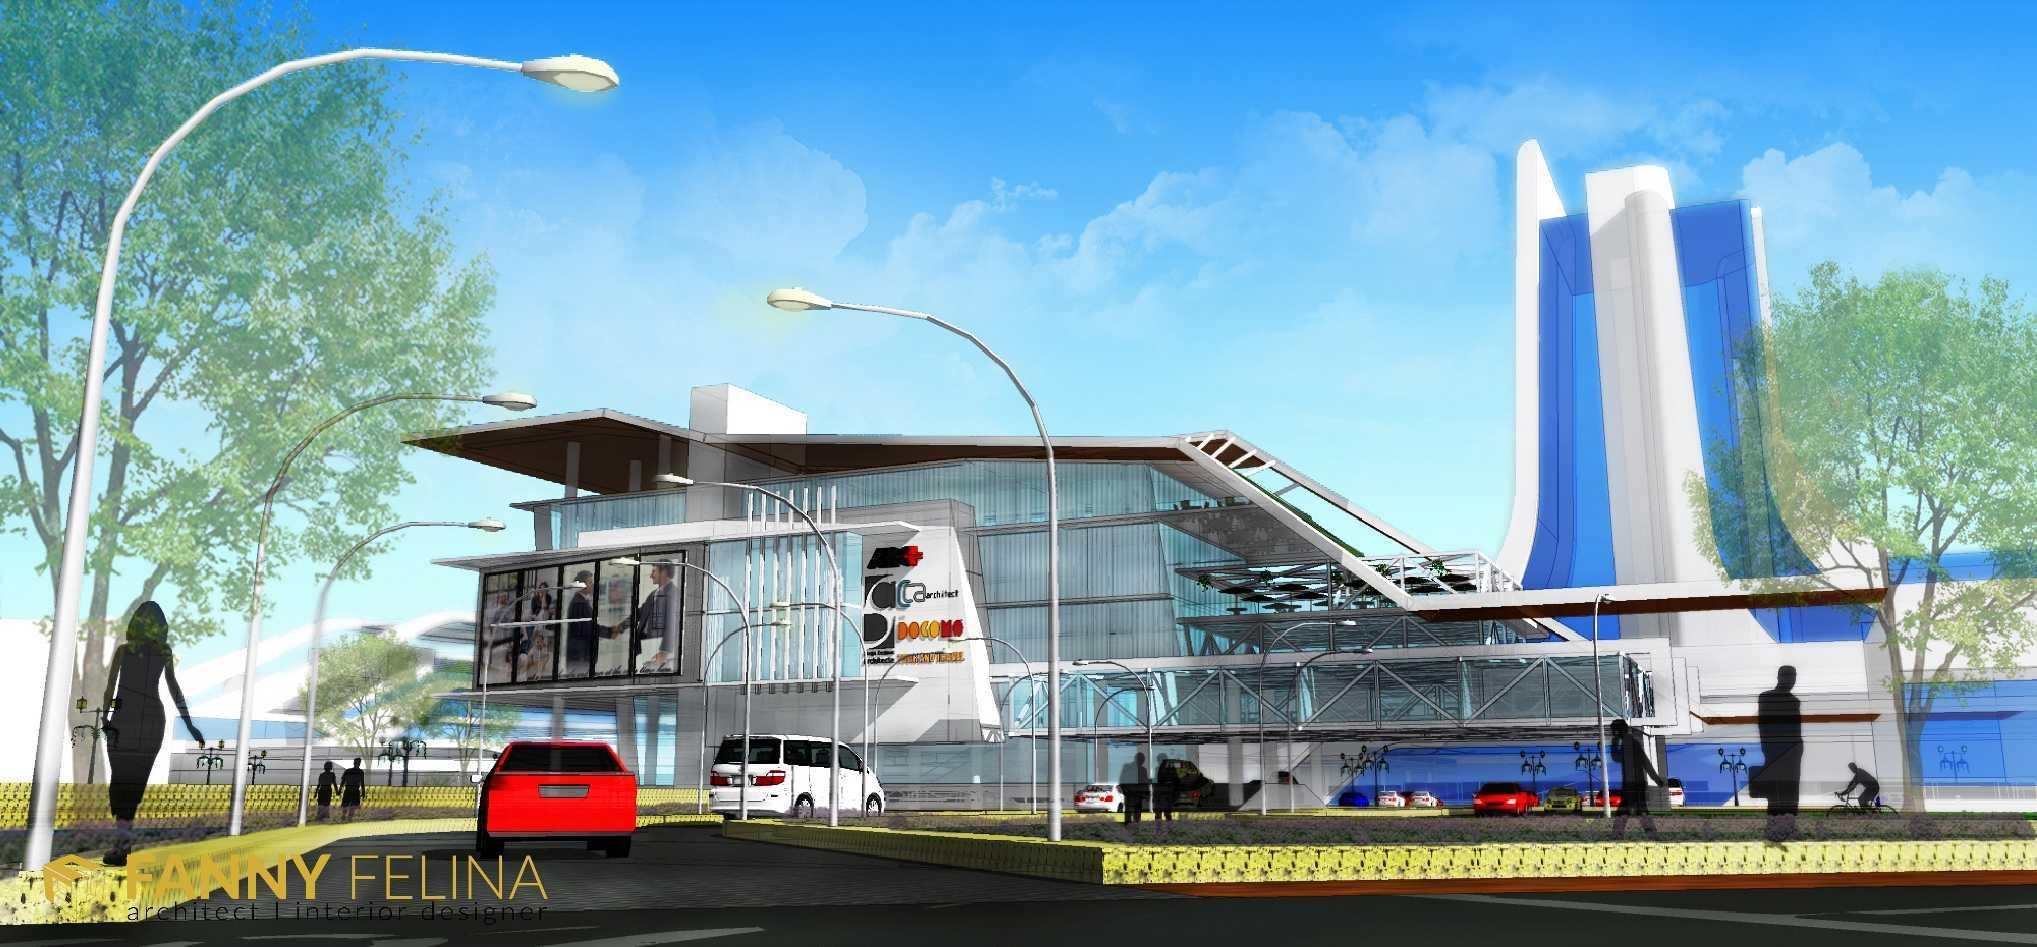 Fanny Felina Architecture & Interior Design Oasystem Office Surabaya, Surabaya City, East Java, Indonesia Surabaya, Surabaya City, East Java, Indonesia 01 Kontemporer,modern  35321